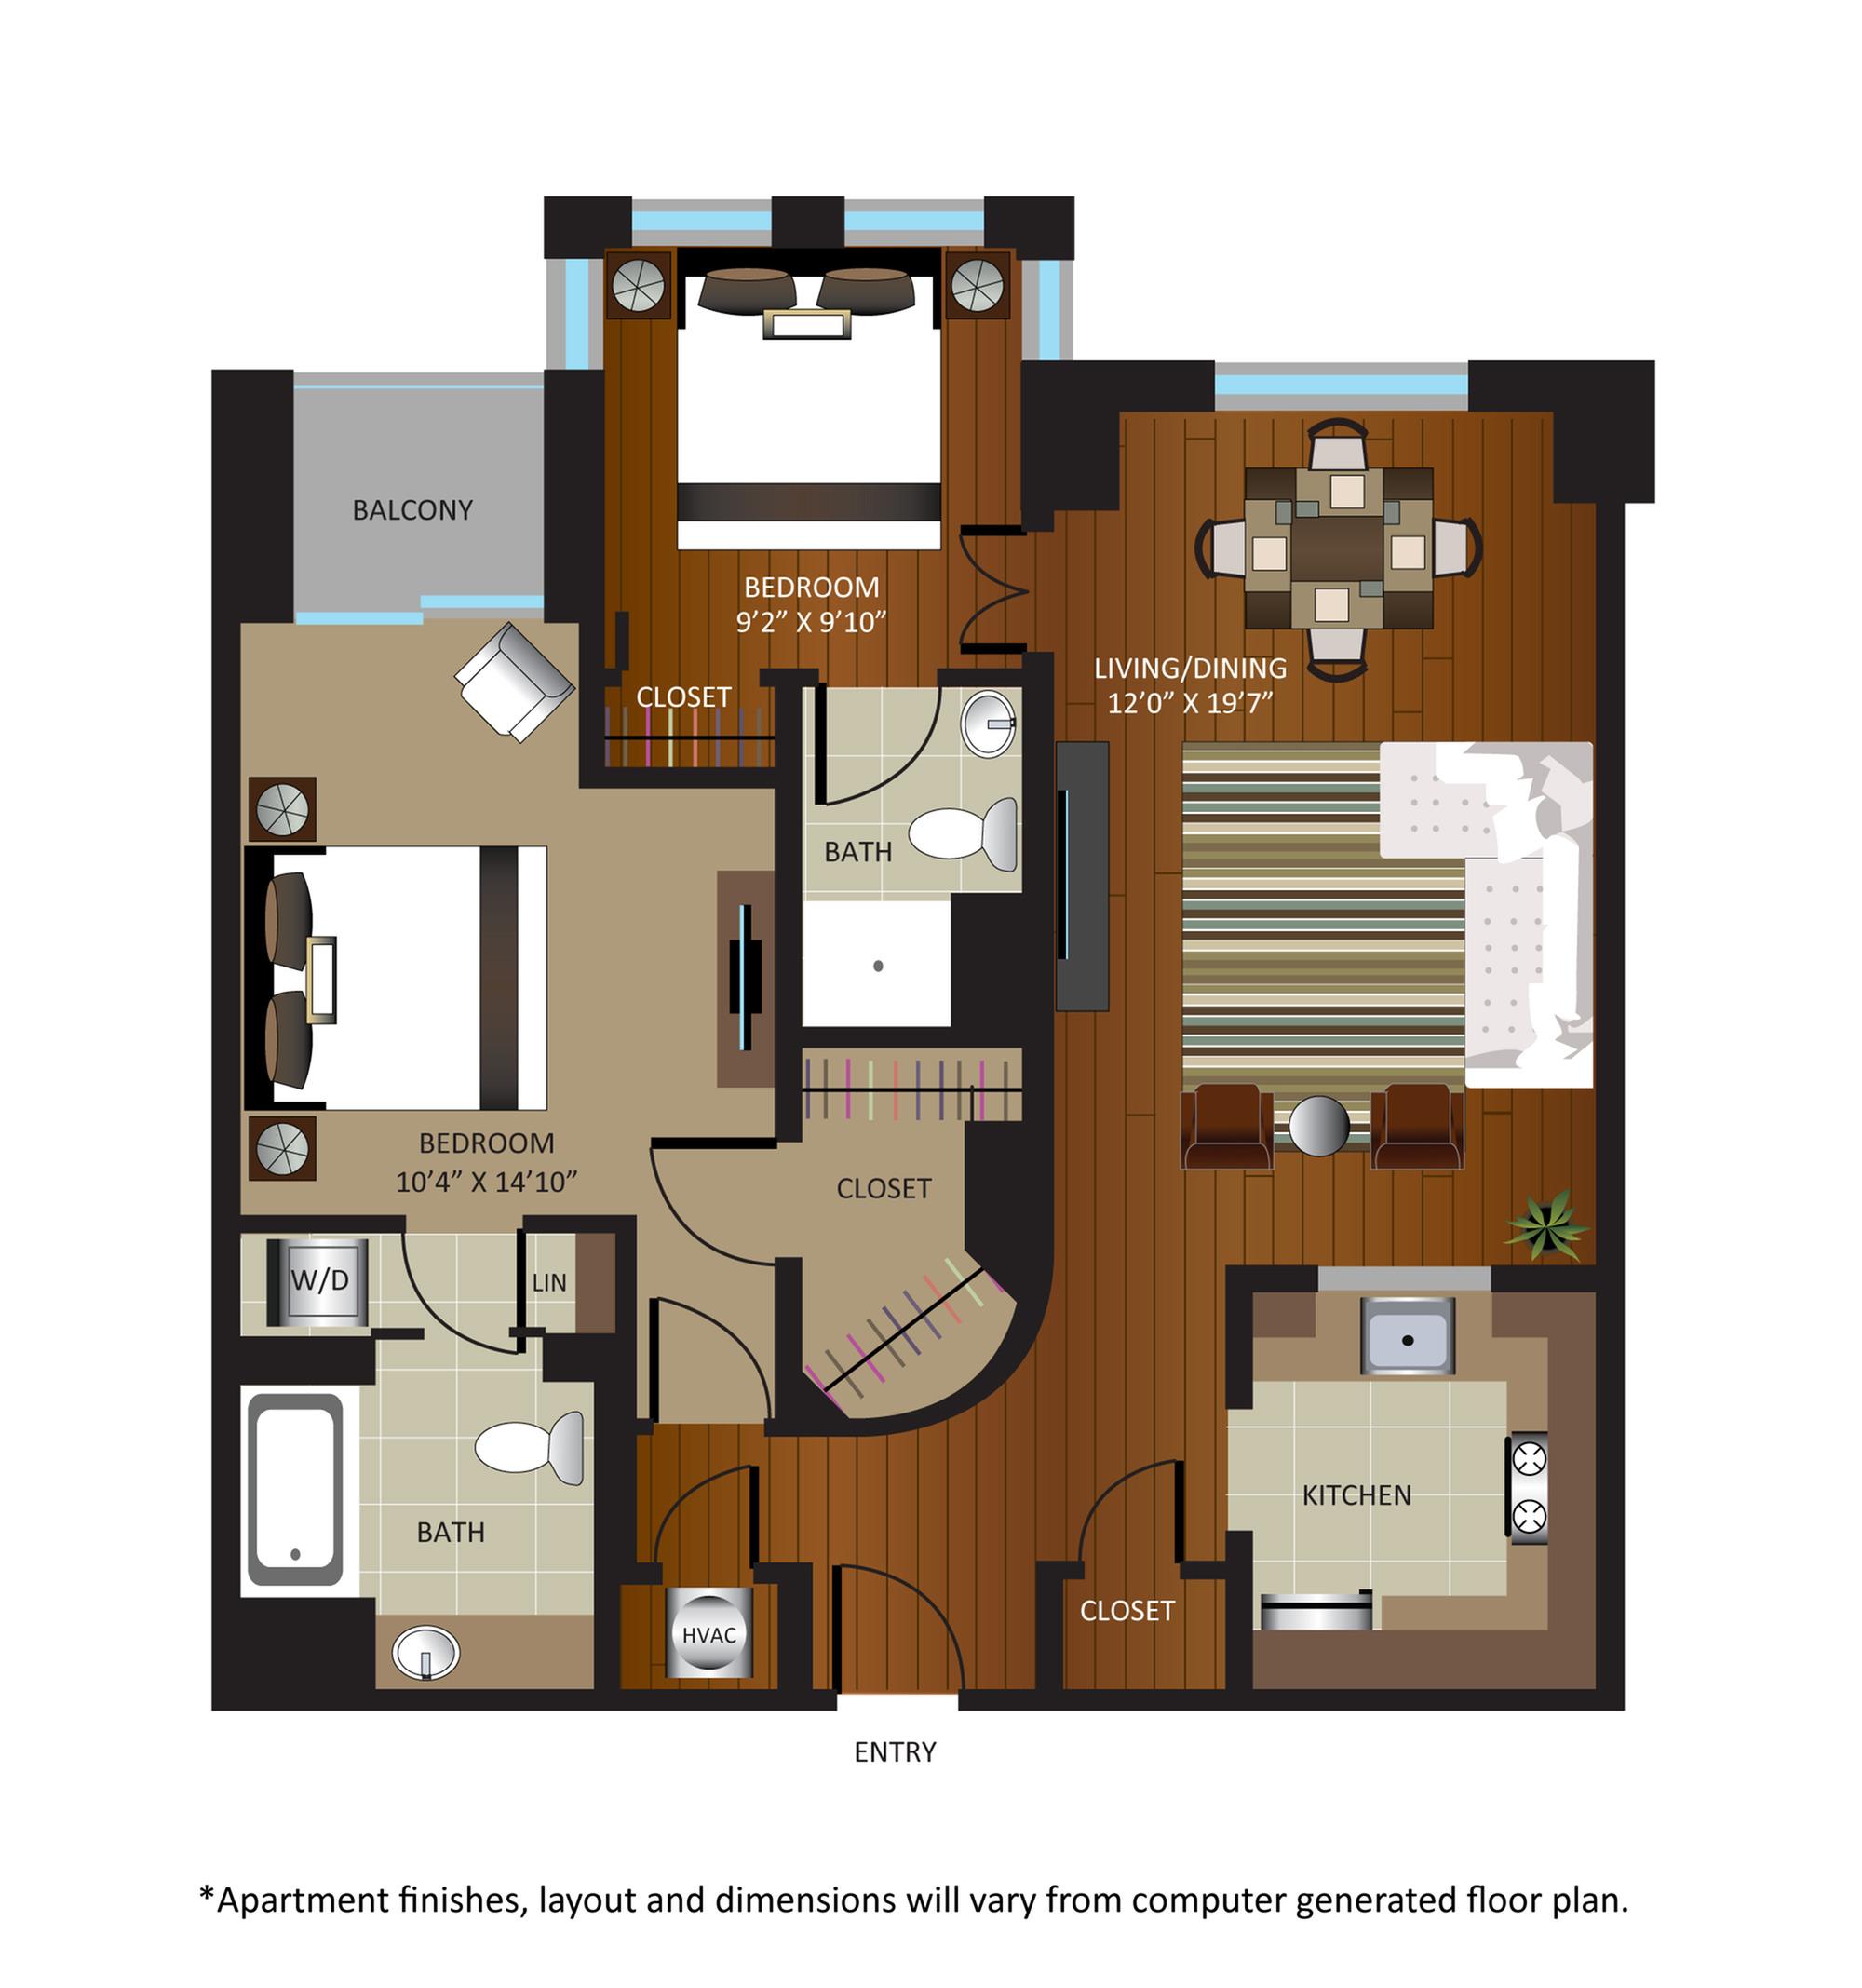 2 Bed / 2 Bath Apartment in Washington DC | Gables Dupont Circle